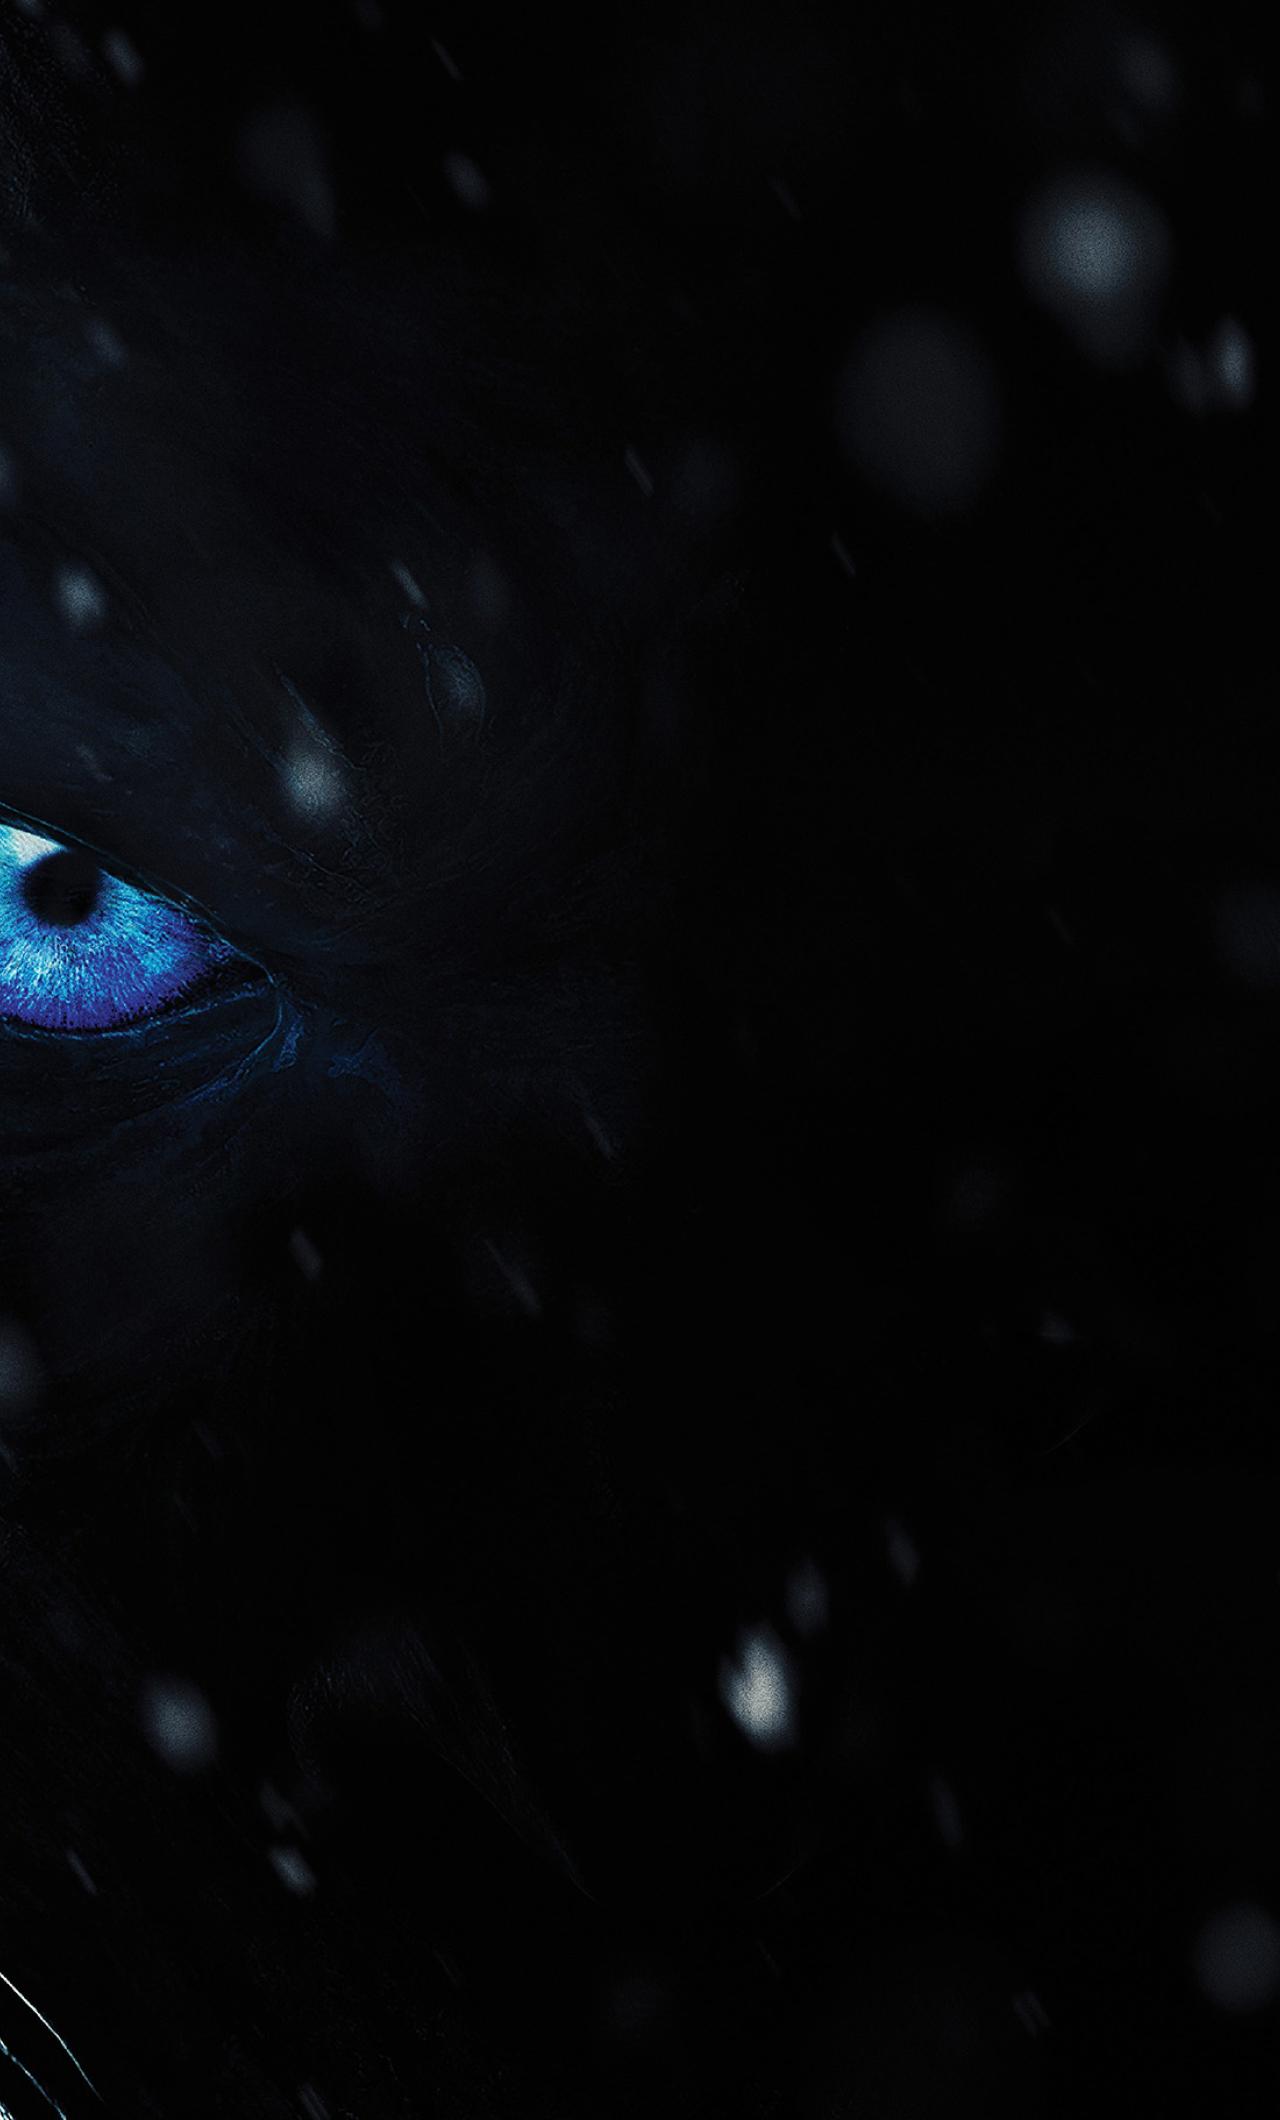 Game Of Thrones Season 7 White Walkers, Full HD 2K Wallpaper